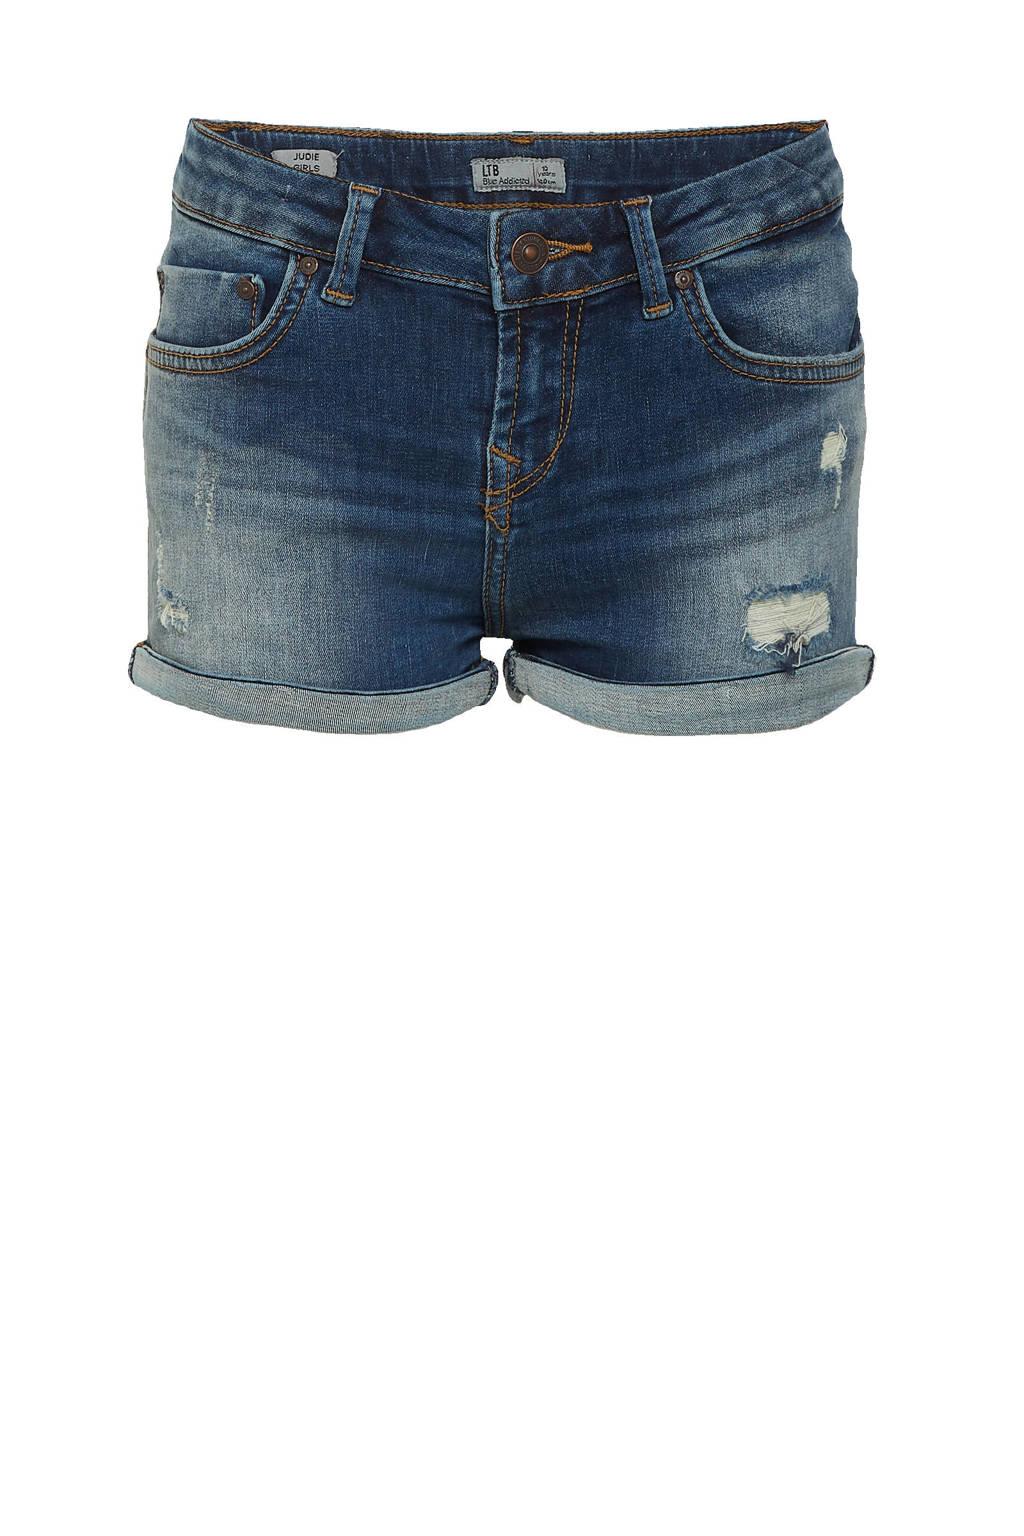 LTB slim fit jeans short Judie linnea wash, Linnea wash